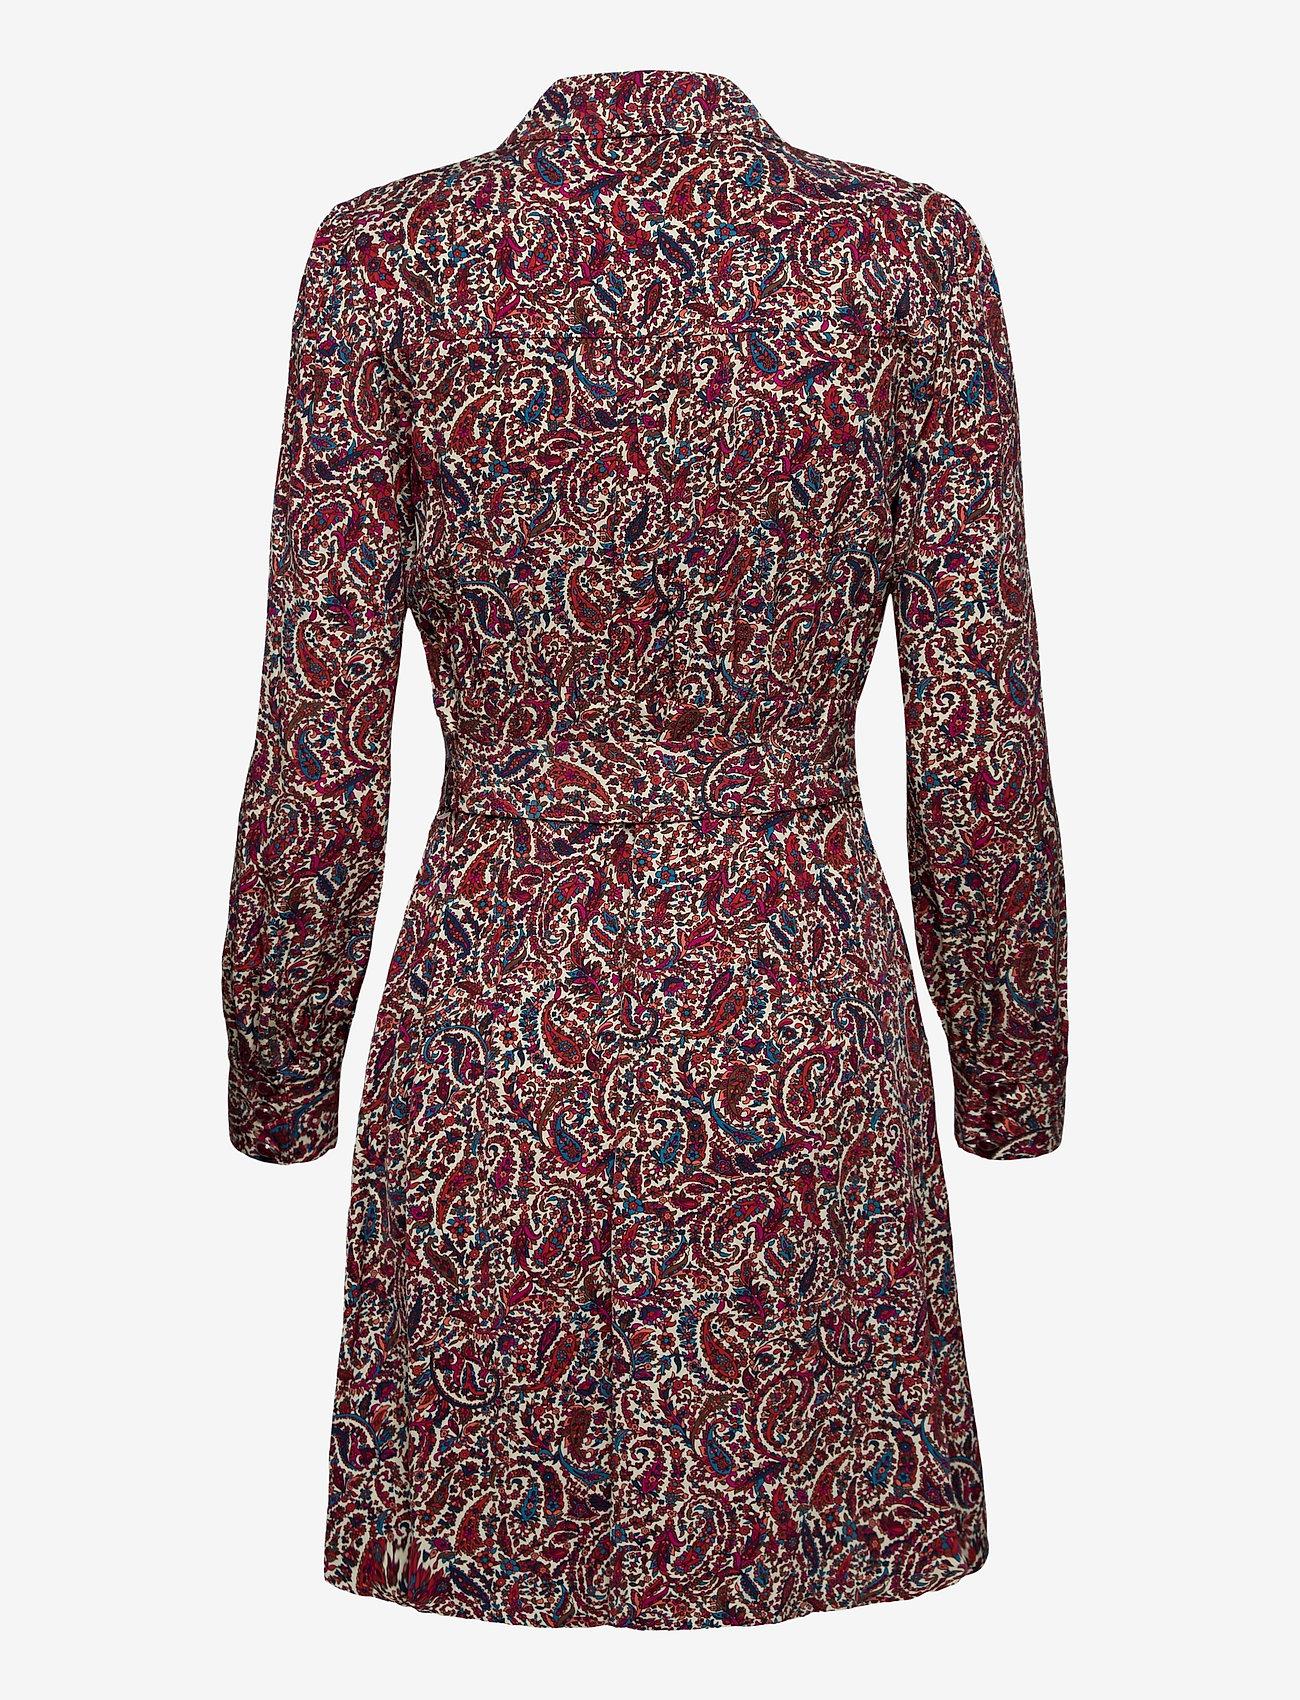 Michael Kors - LUSH PSLY GARDN DRESS - alledaagse jurken - dark ruby - 1